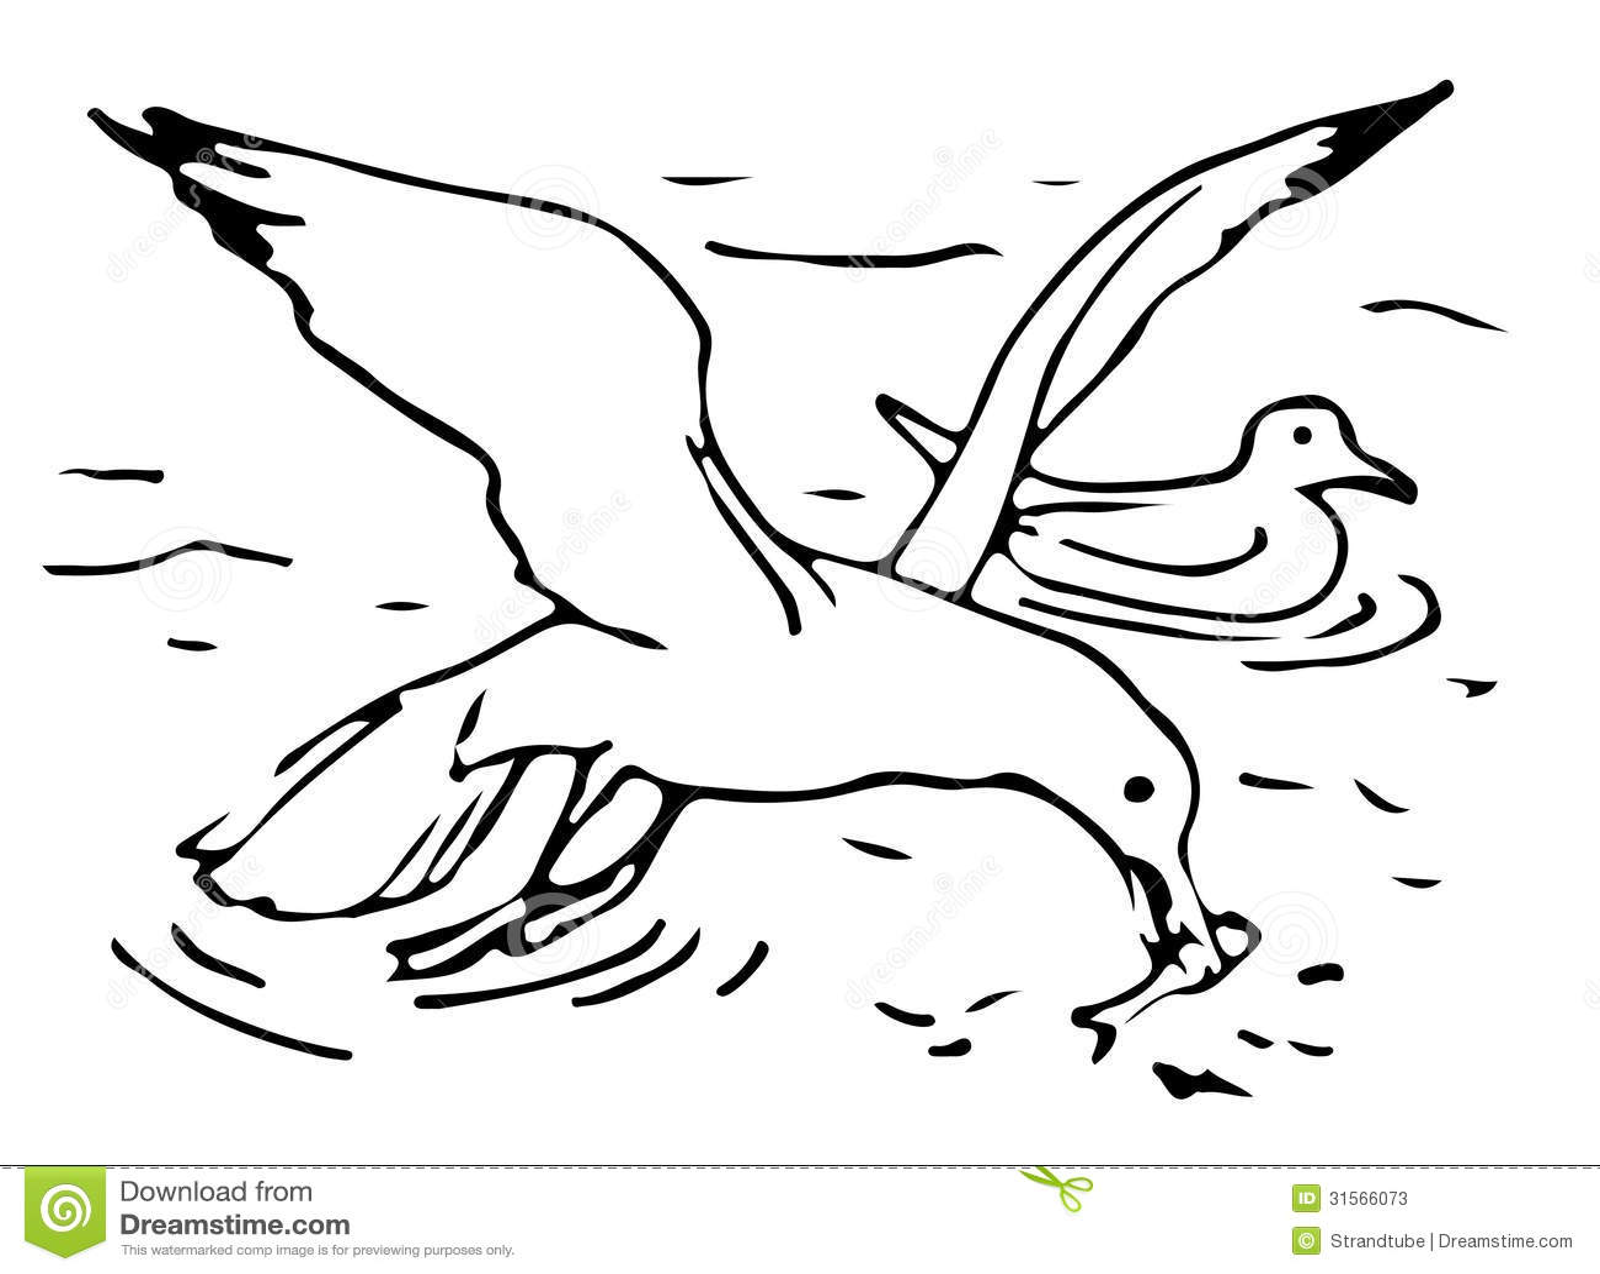 Seagulls Stock Illustration Illustration Of Shore Crab